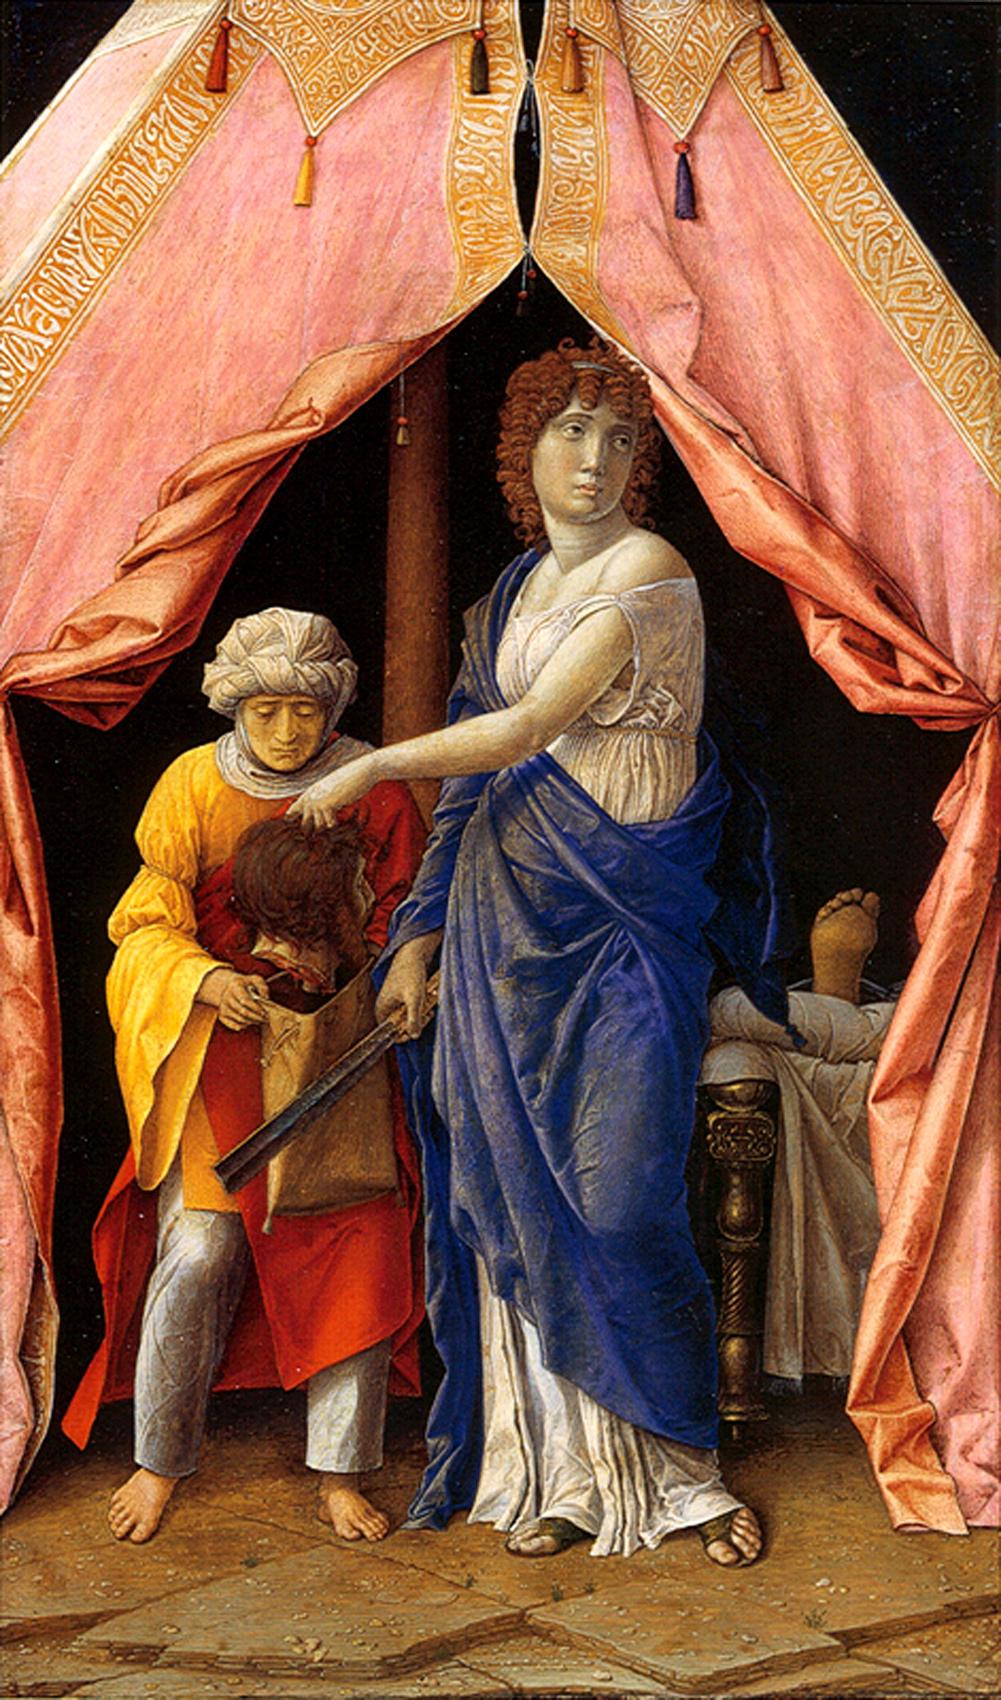 Andrea Mantegna, Judith und Holofernes, ca. 1495